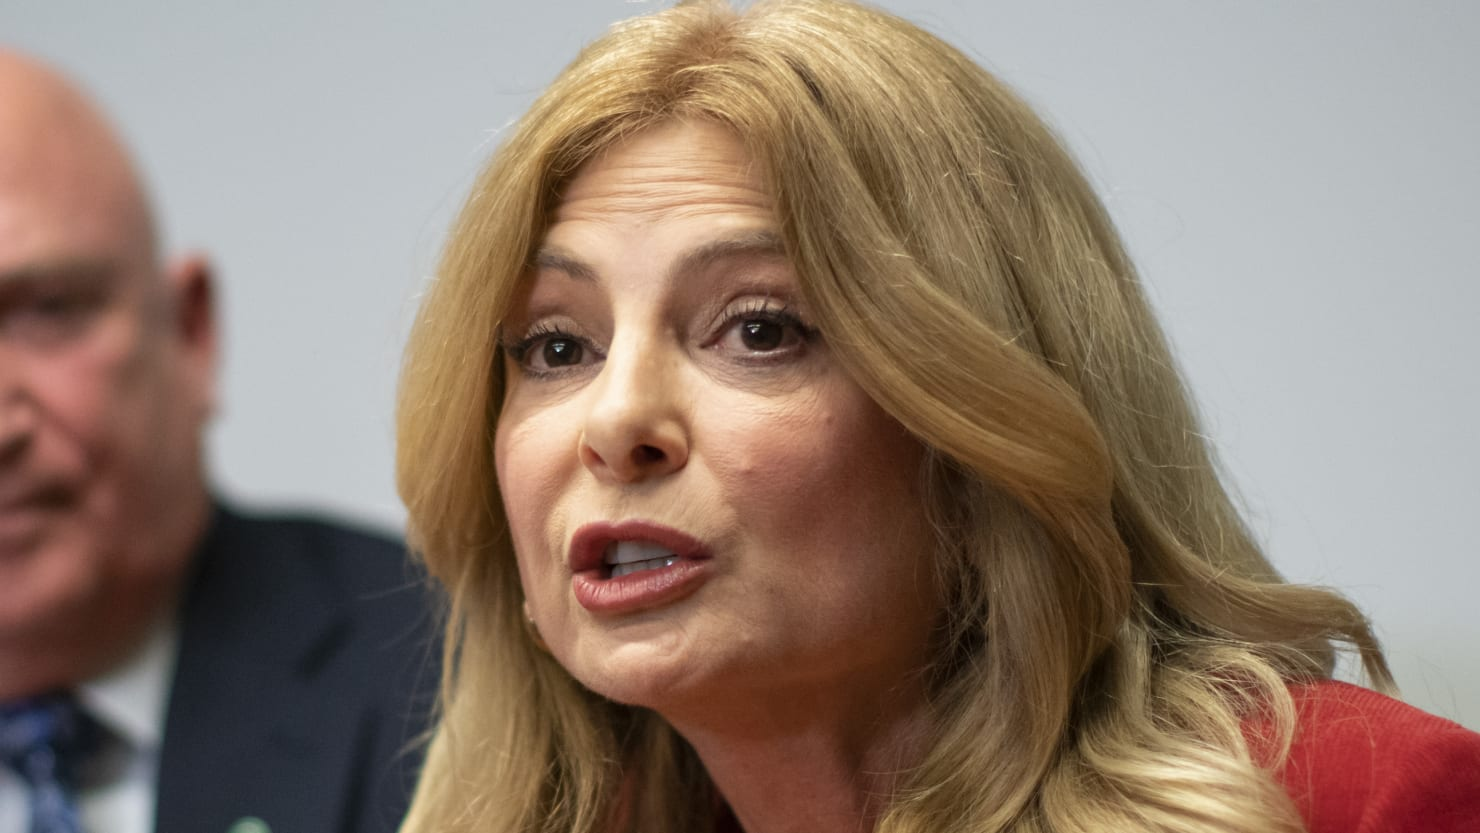 Ex-Weinstein Attorney Lisa Bloom Loses Money Grab in Autistic Kid's Settlement